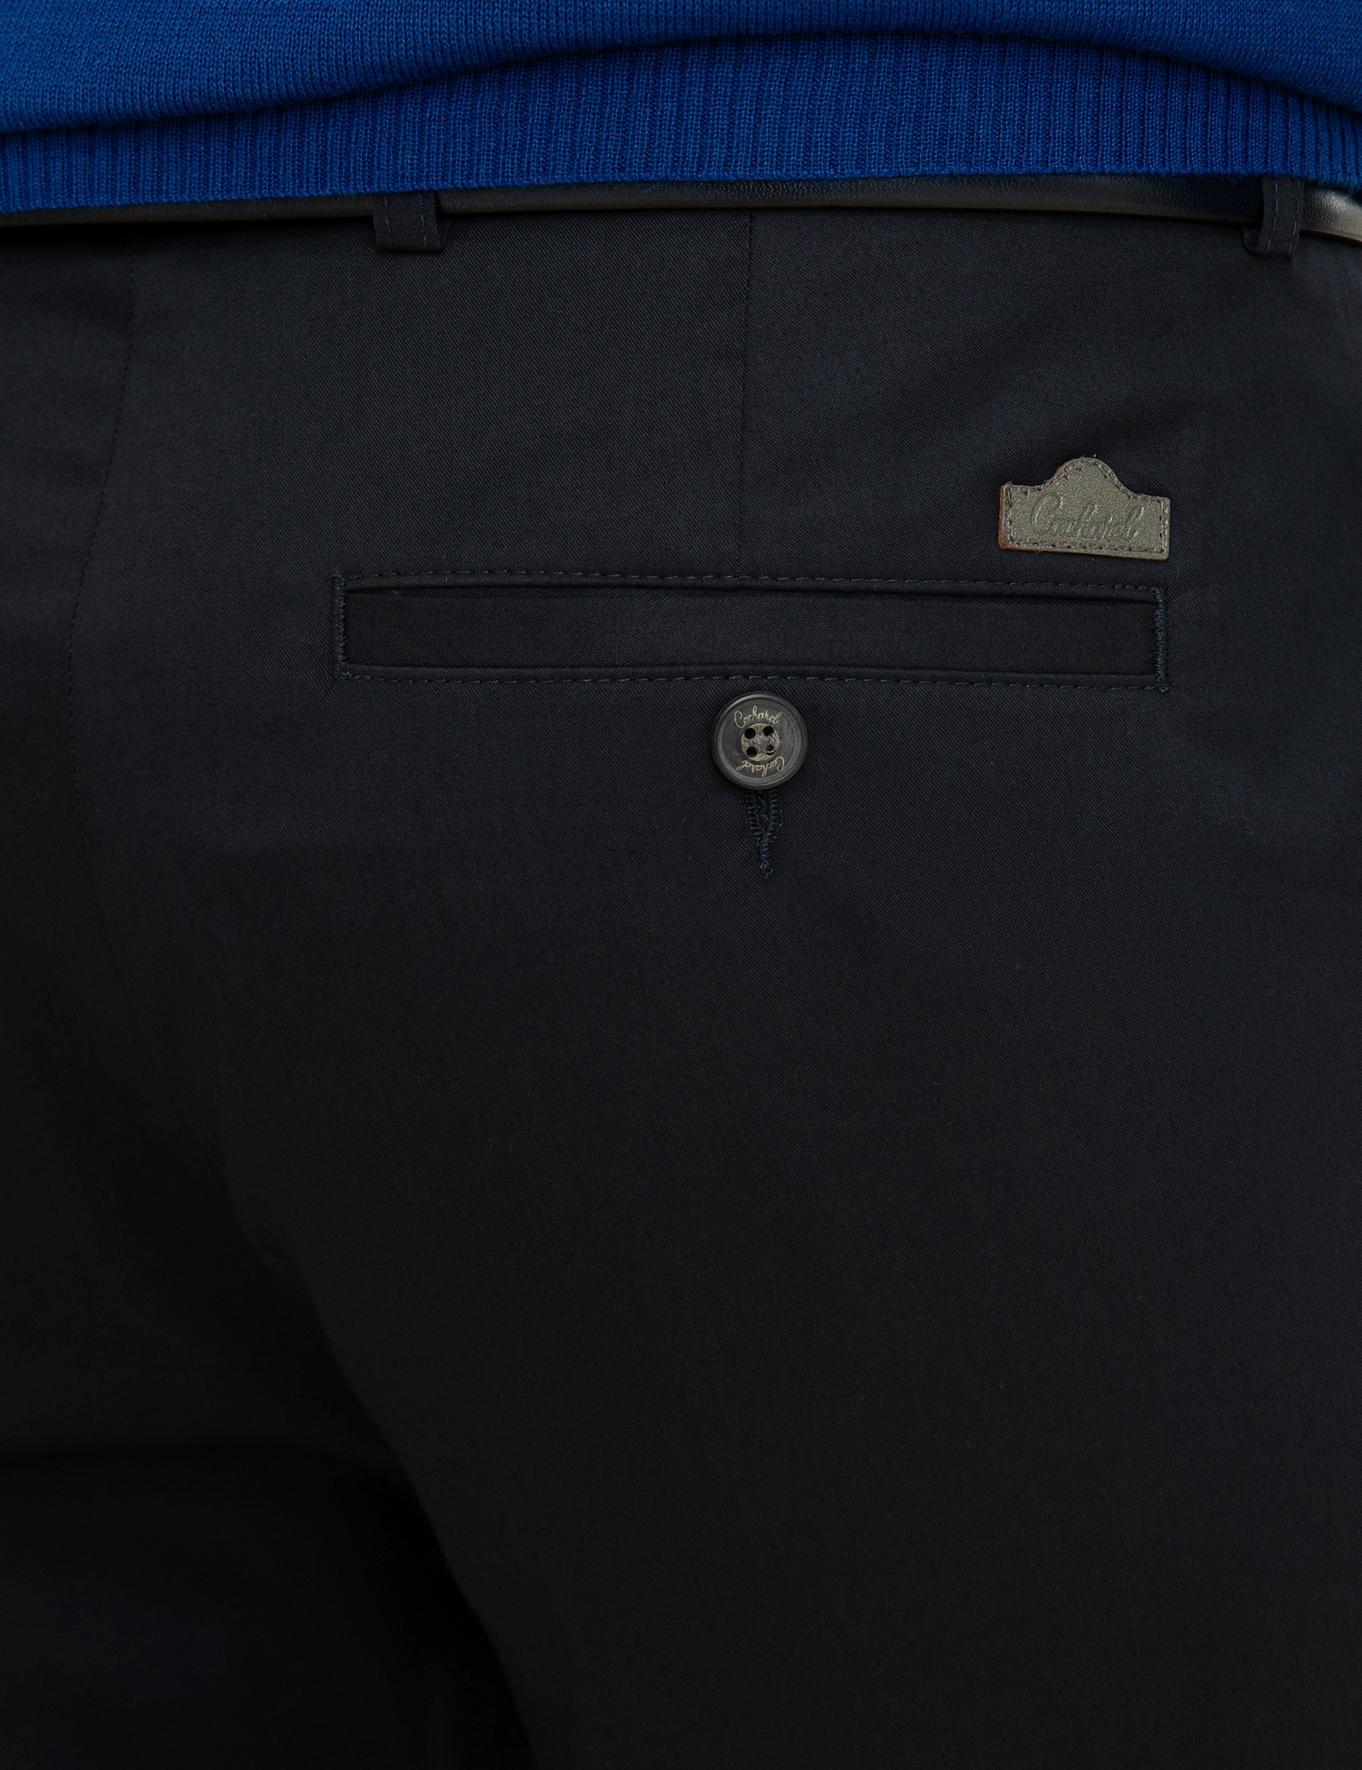 Lacivert Slim Fit Chino - 50225936008